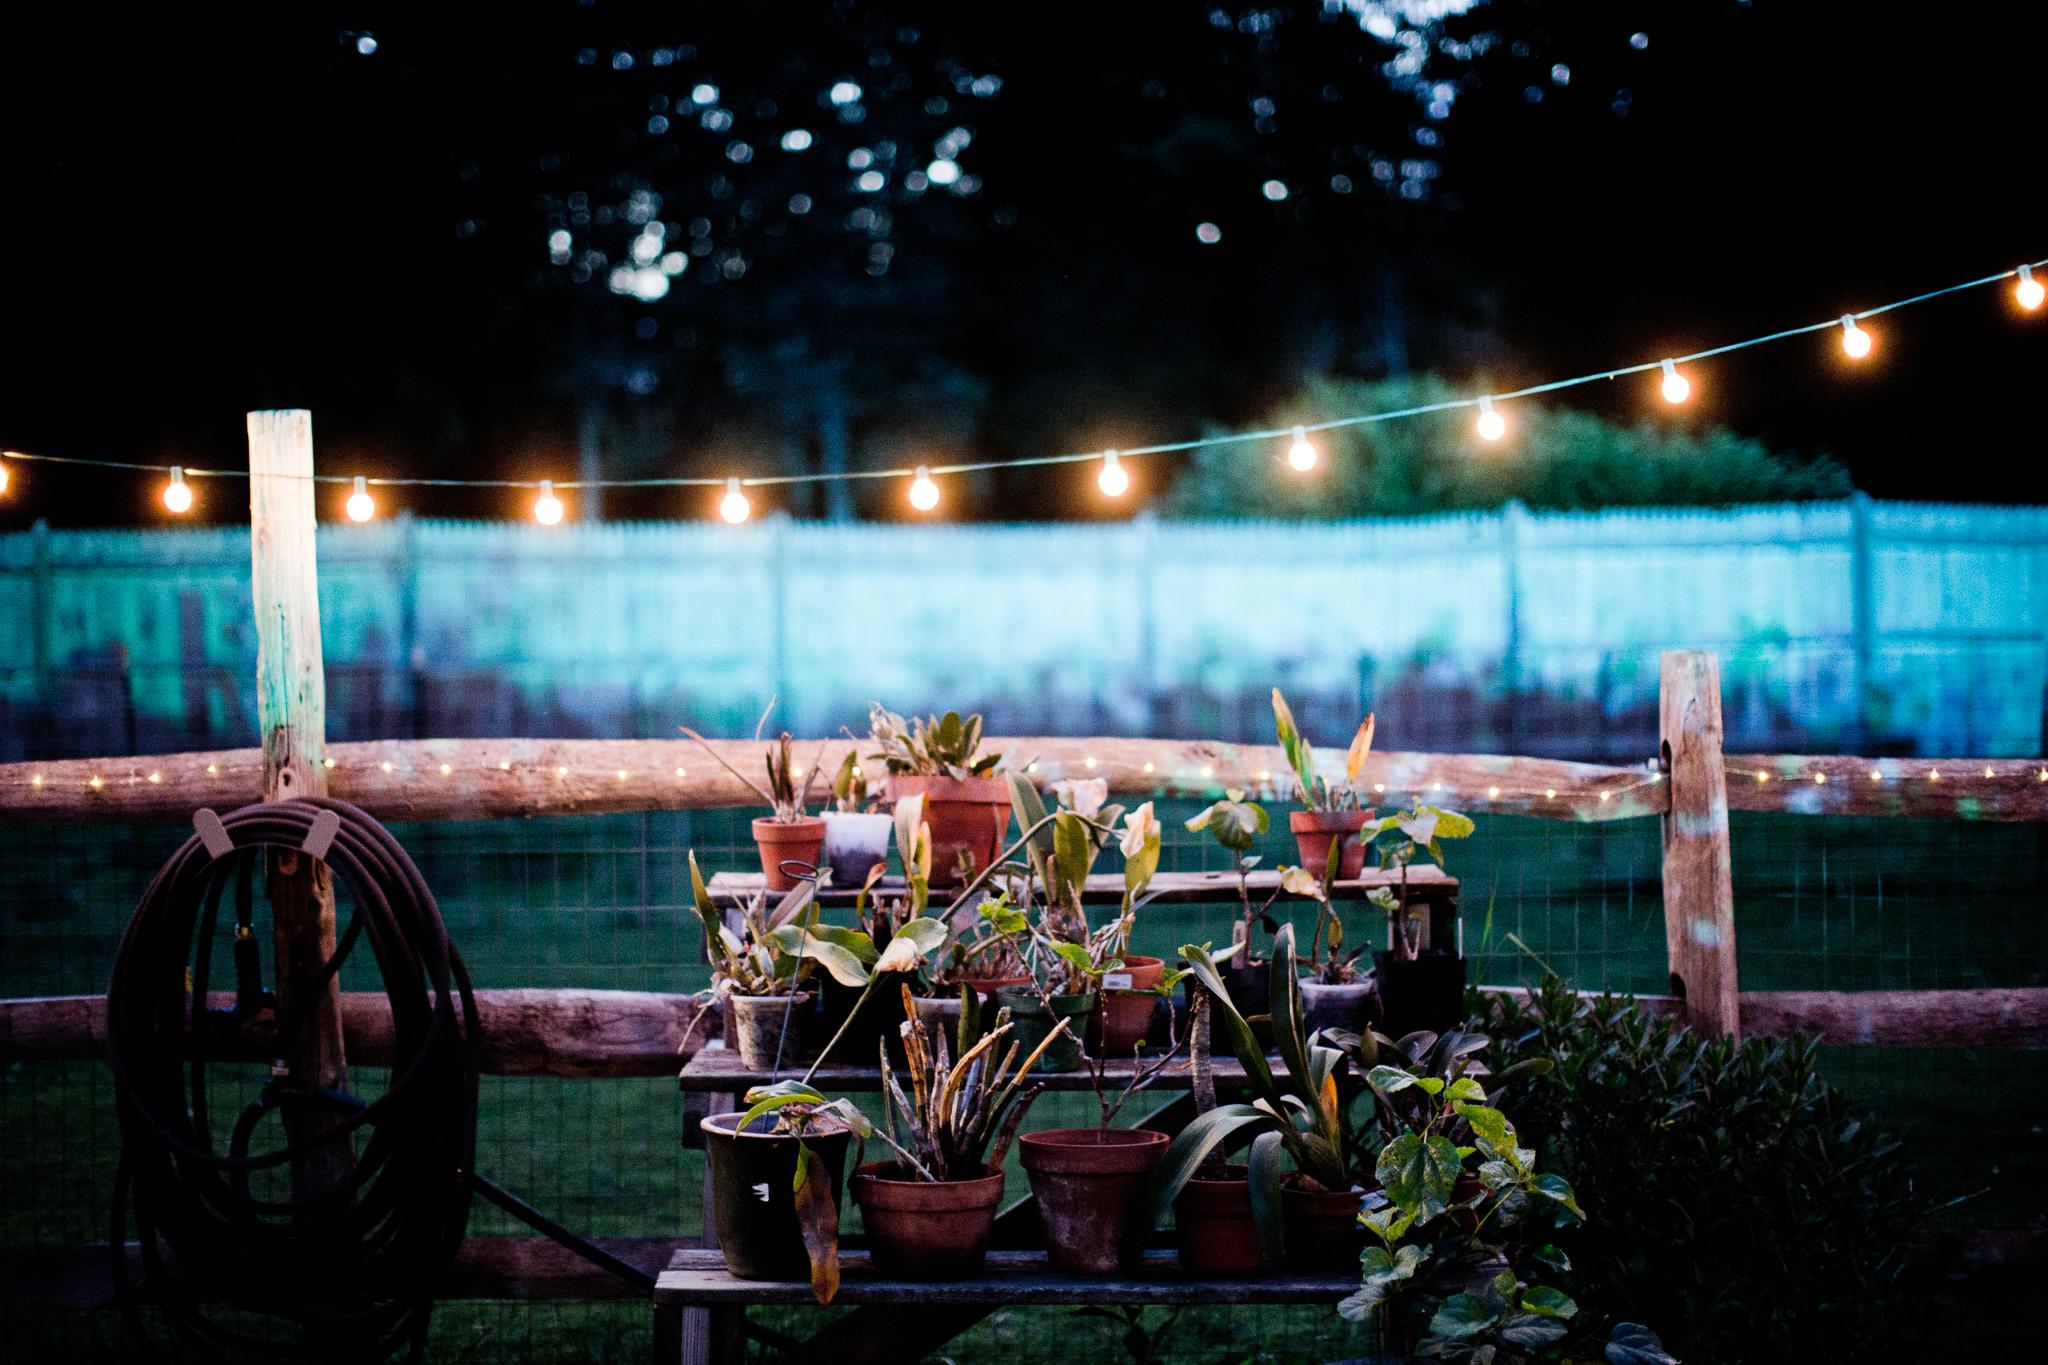 055_Canada-documentary-wedding-photograp